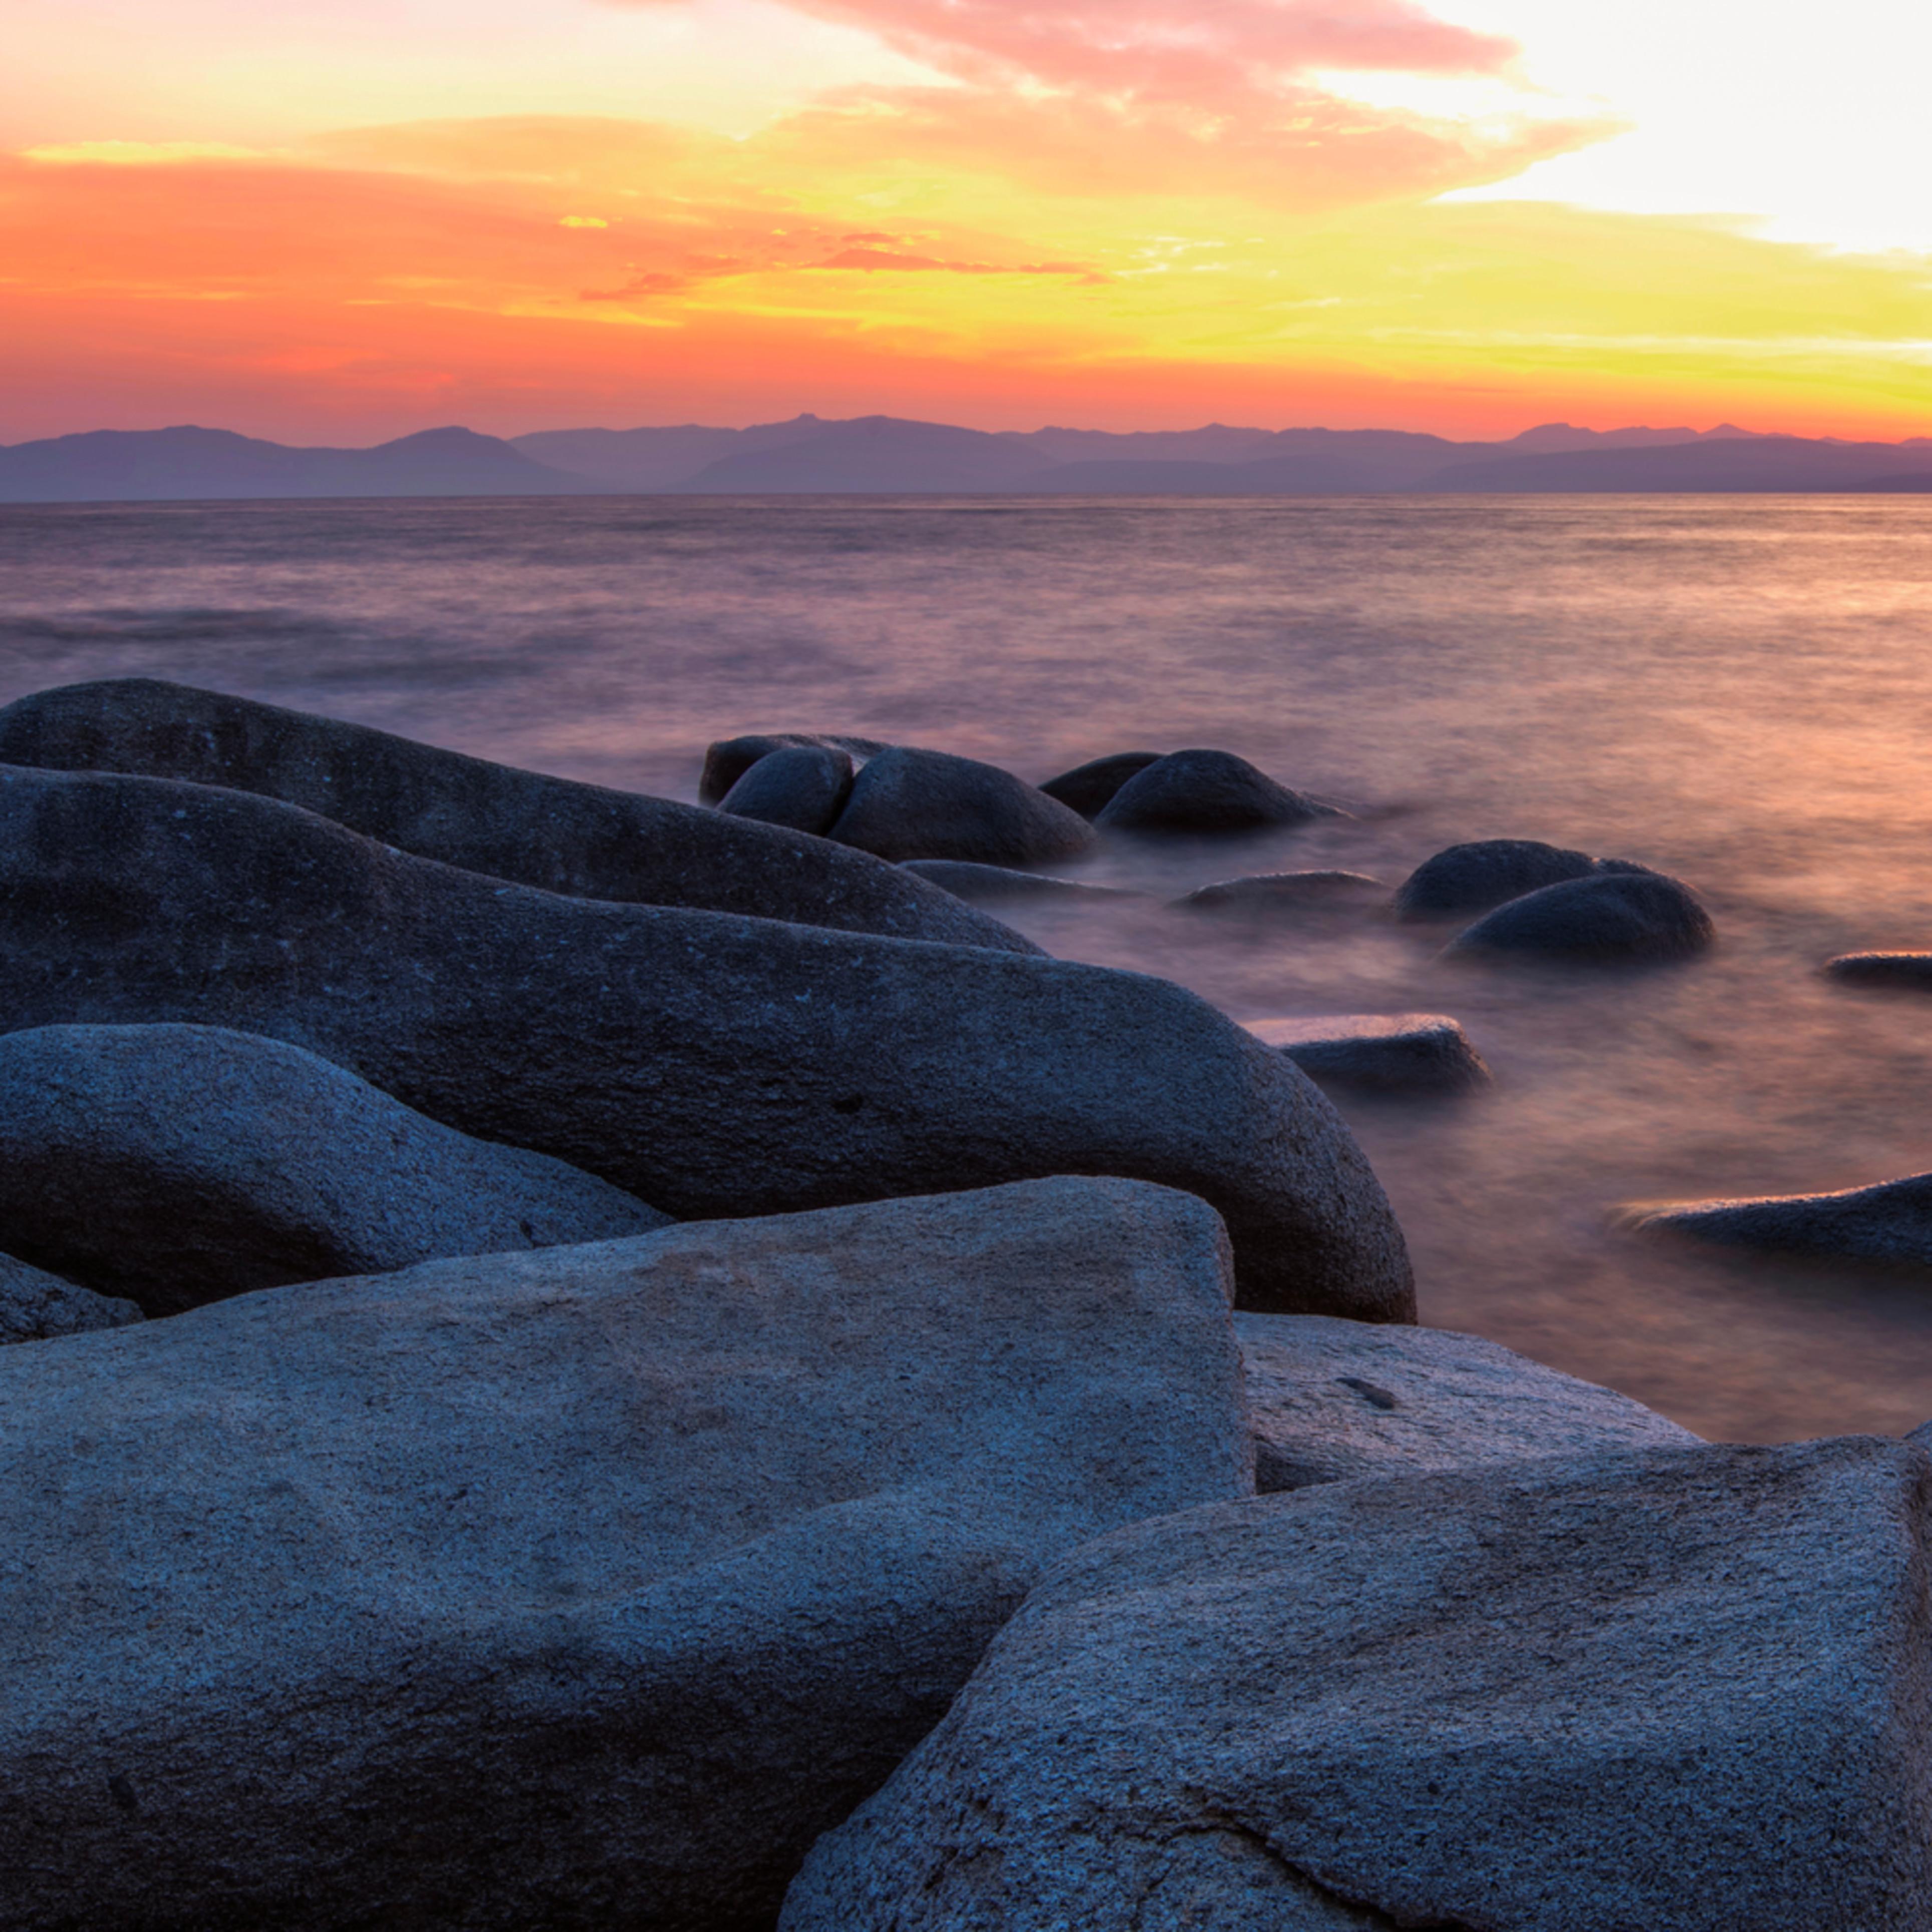 East shore rocks sunset pano fegirm